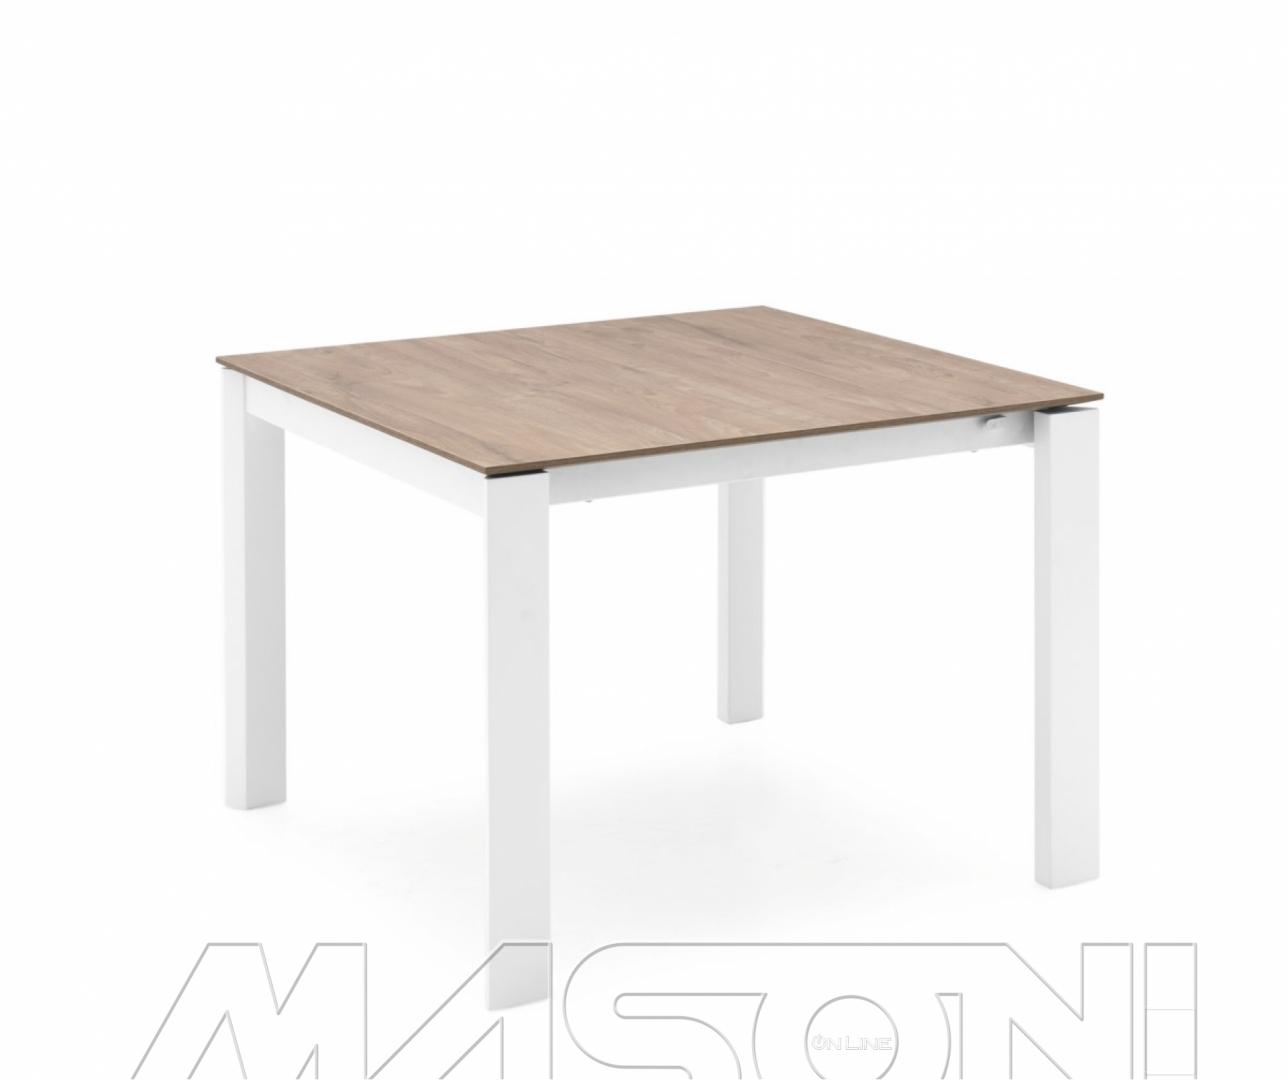 Eminence tavoli tavoli allungabili connubia by for Tavolo eminence calligaris